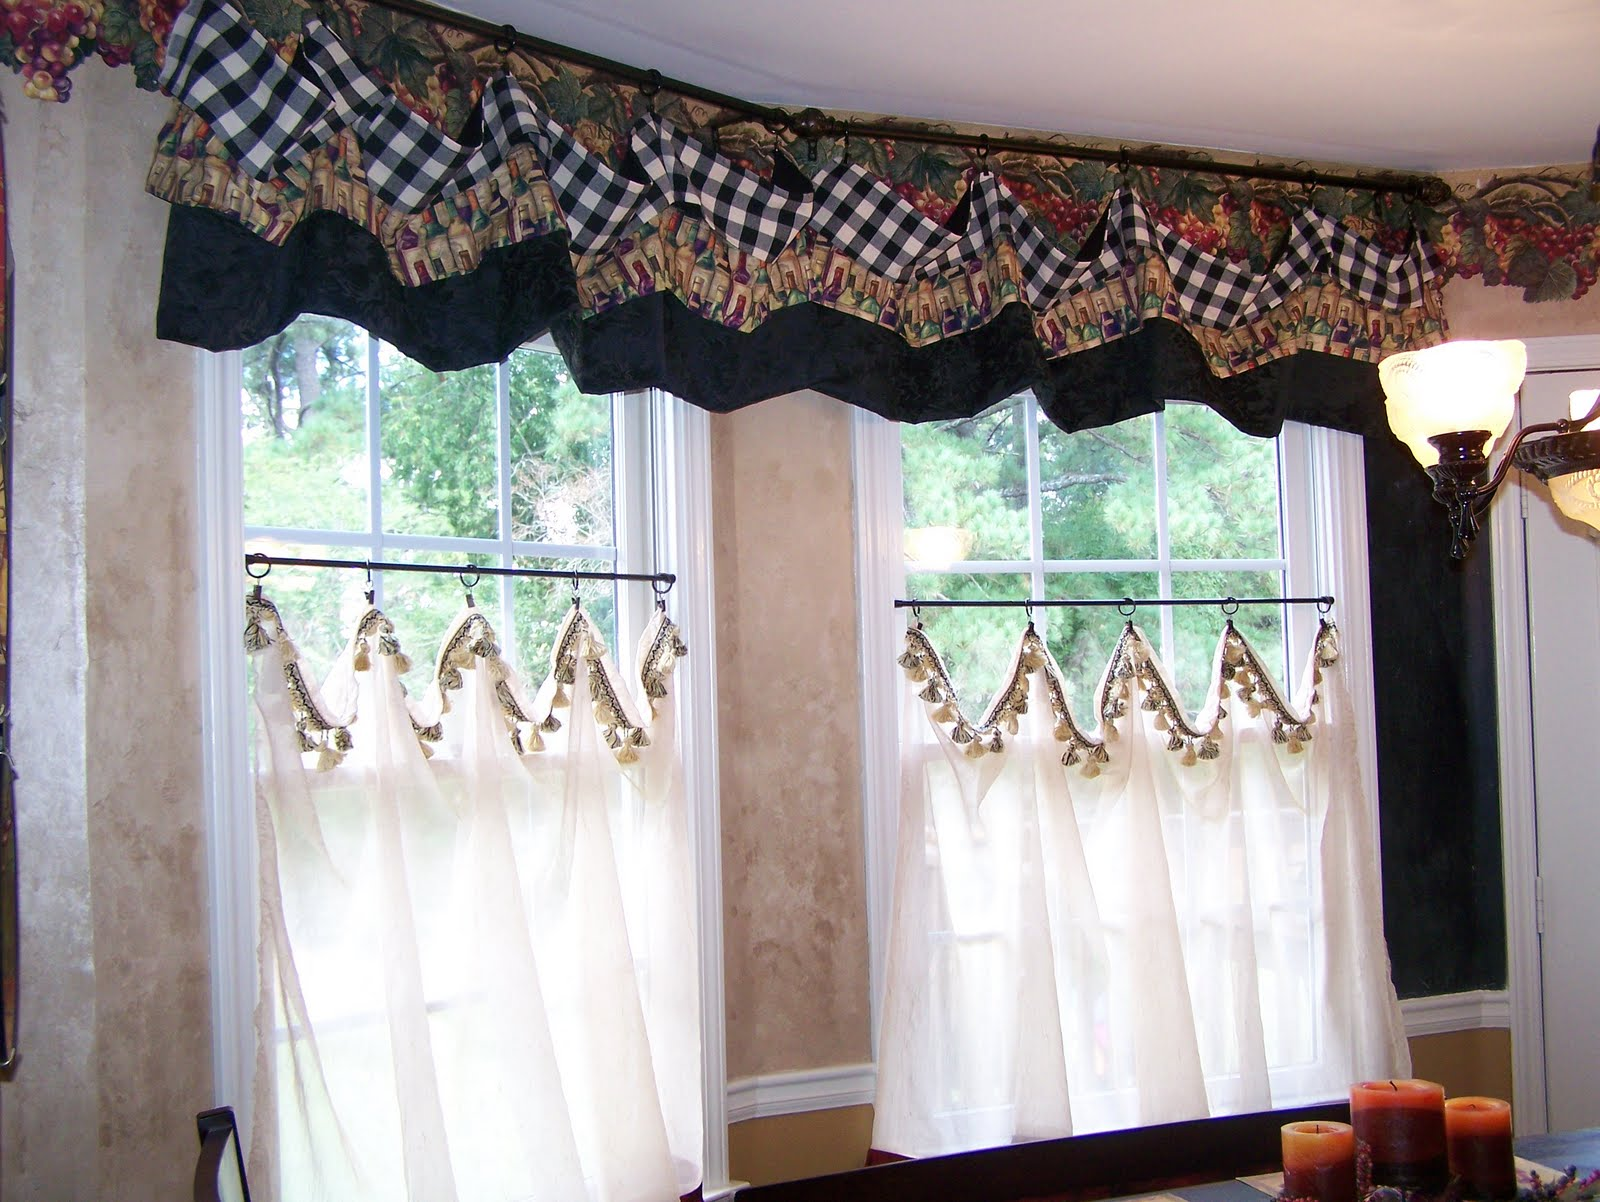 Curtains Amp Patchwork Curtains On Pinterest Patchwork